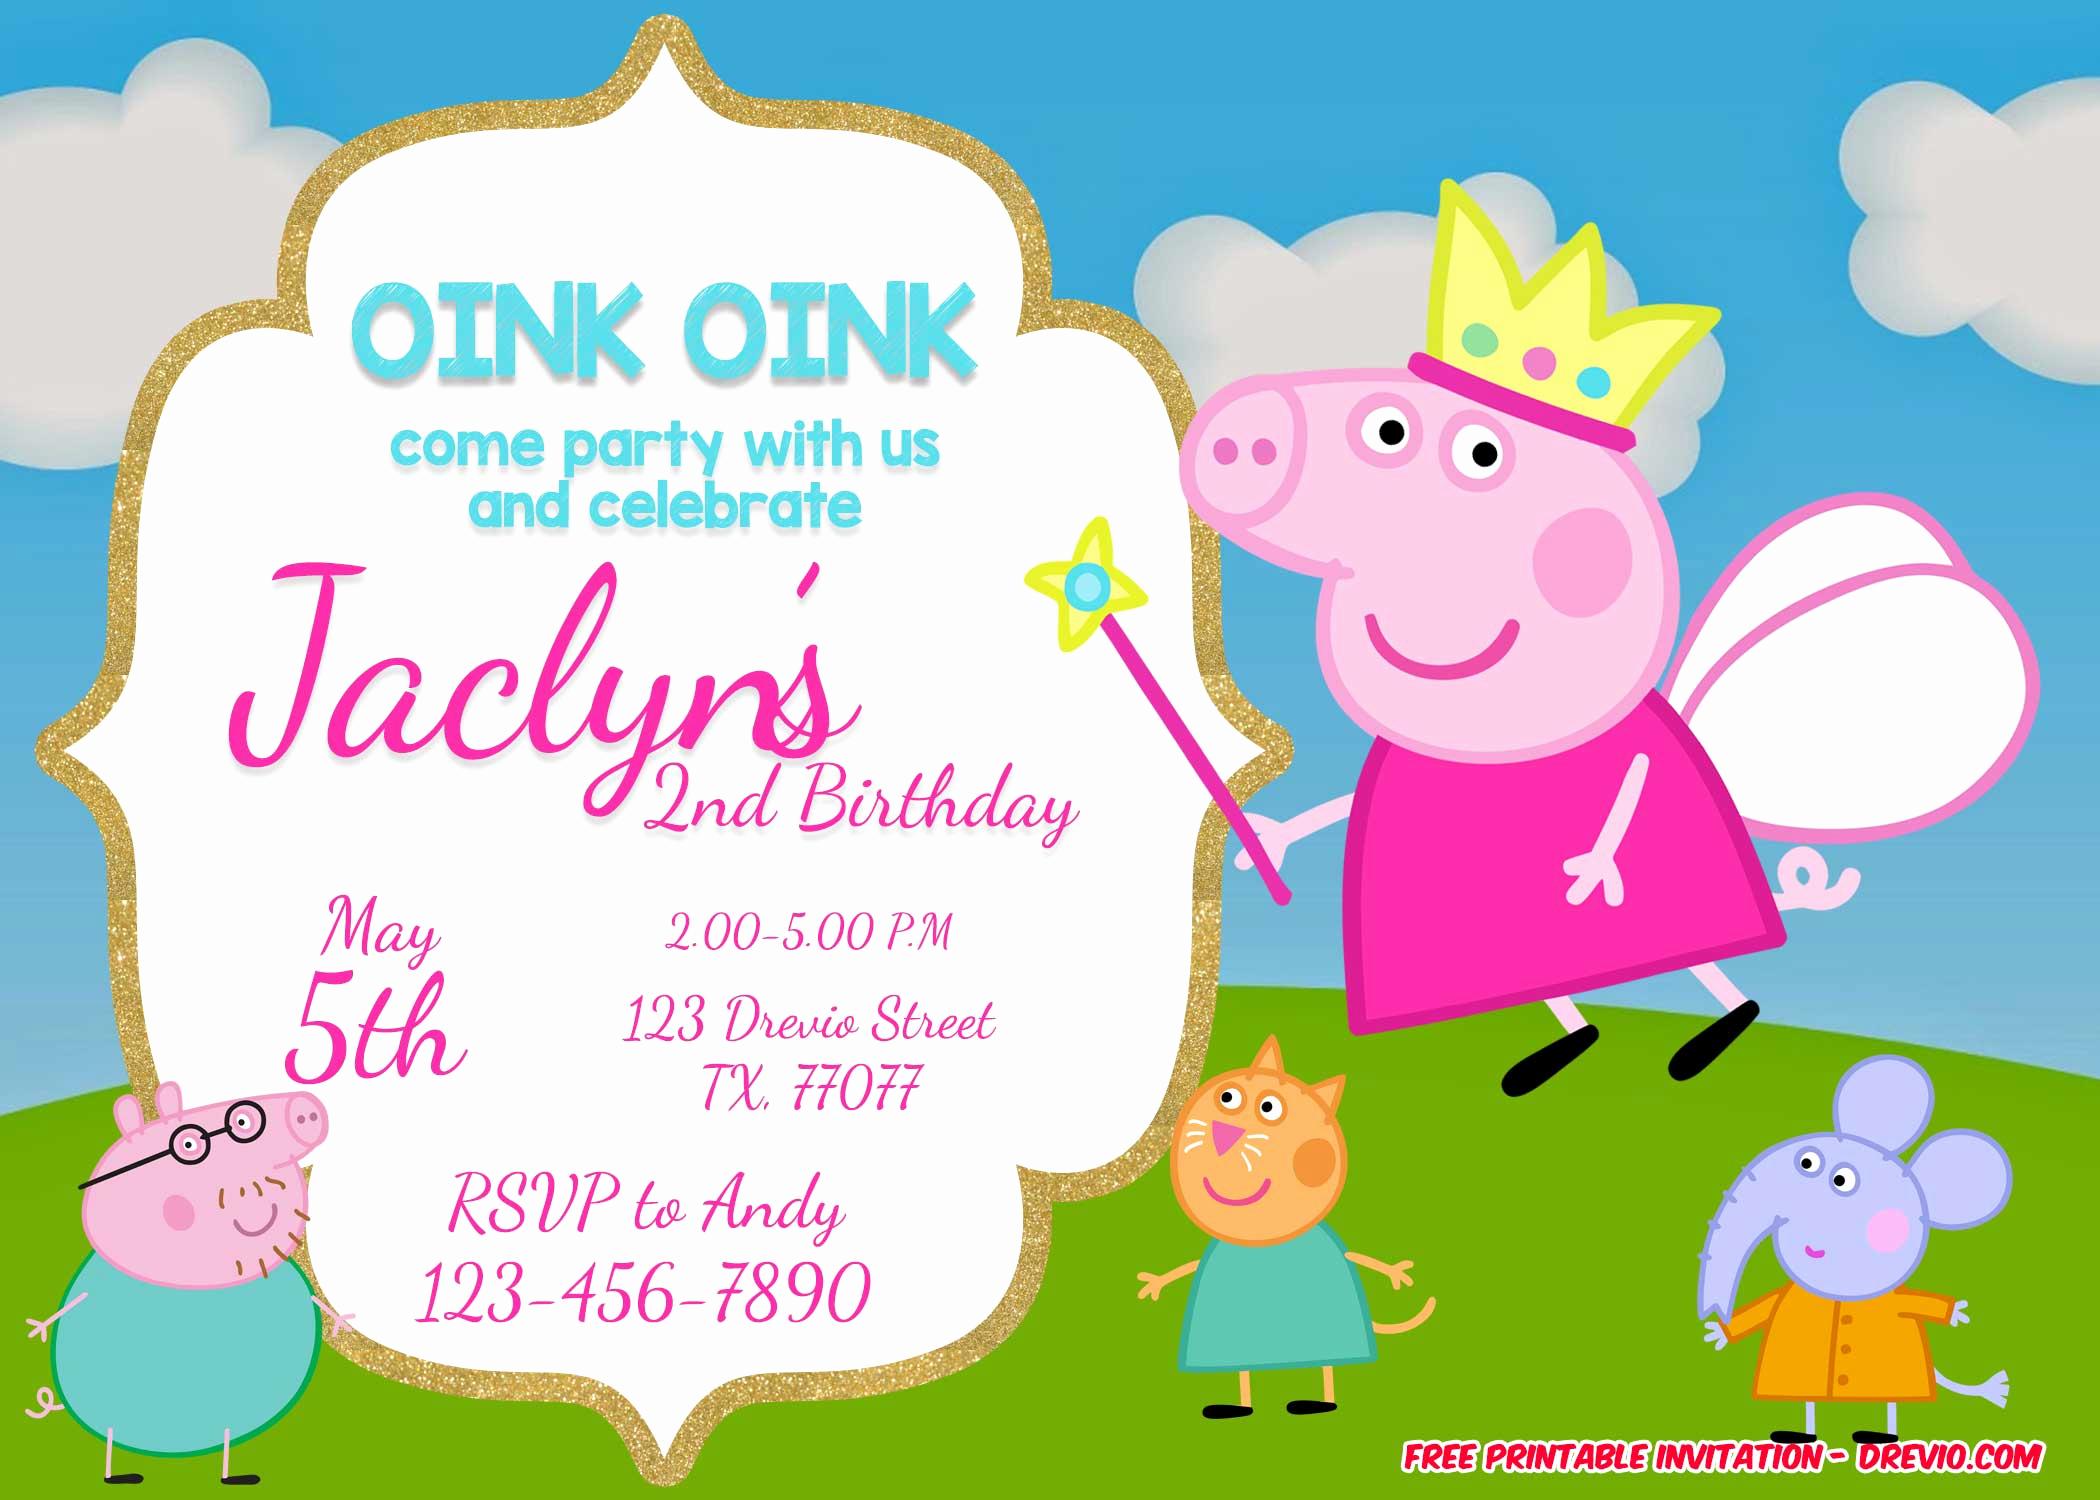 Peppa Pig Invitation Template New Free Printable Peppa Pig Invitation Birthday Templates